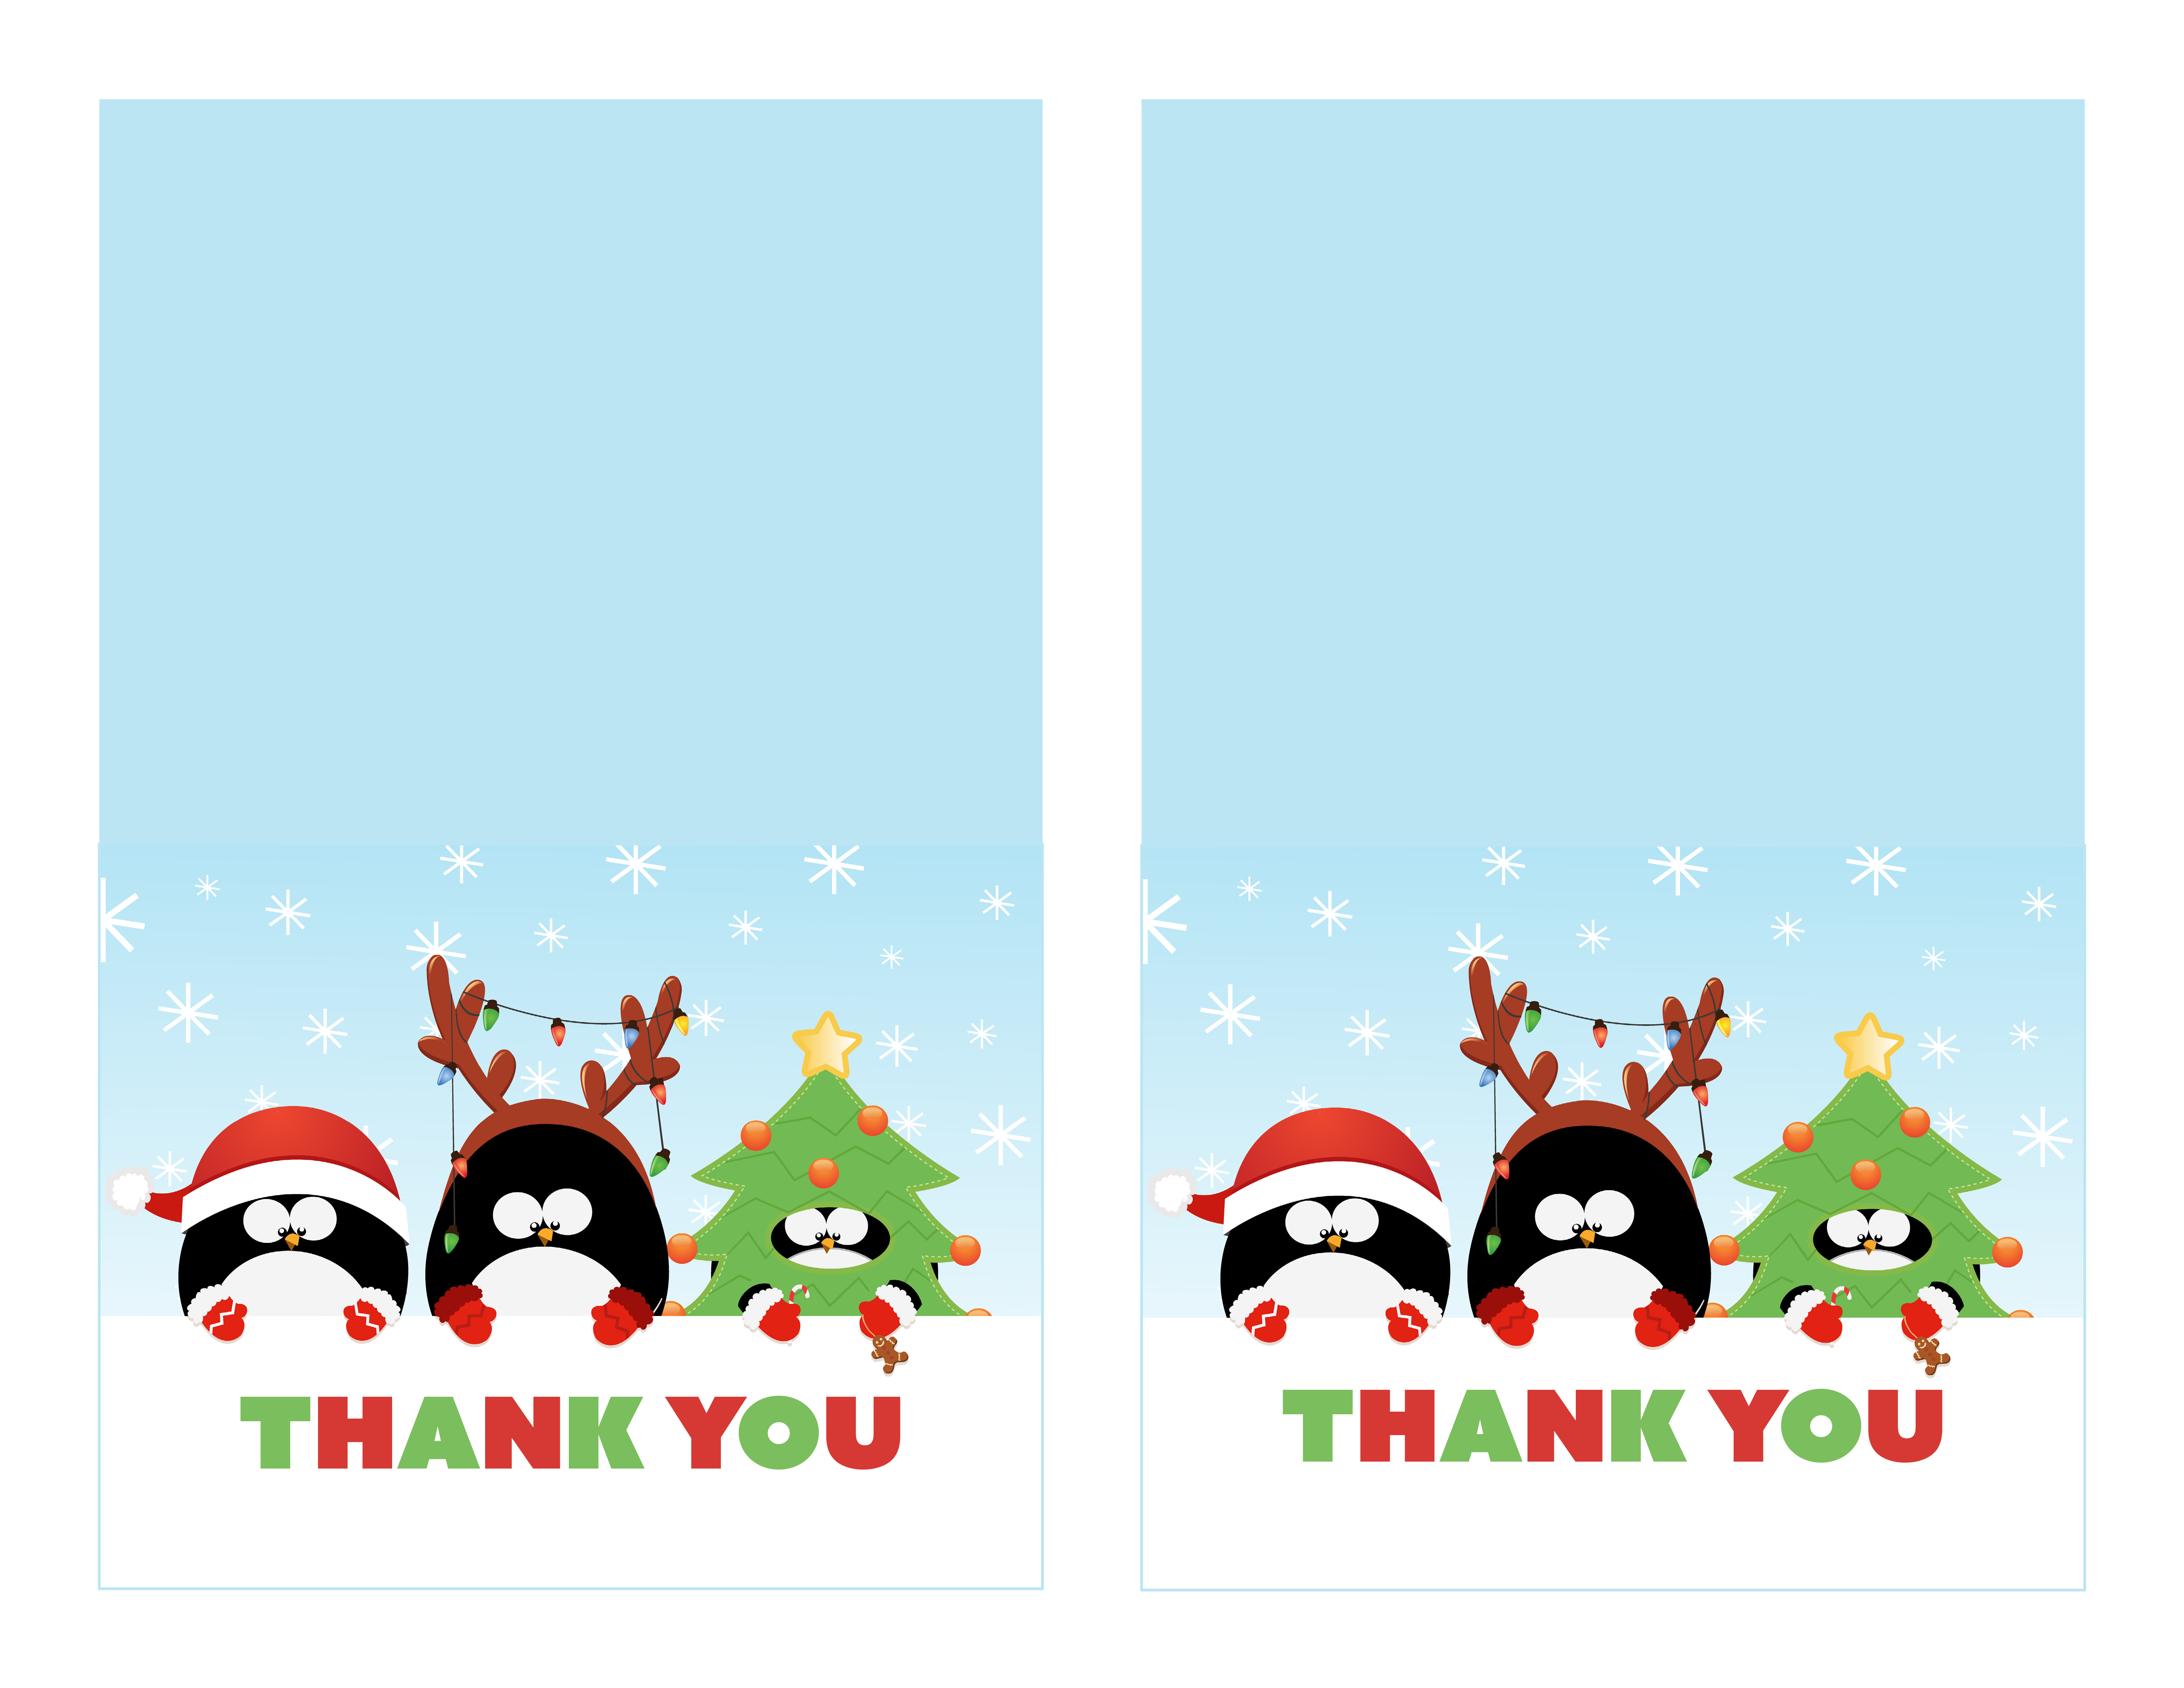 Grandparents Day Cards Printable - Printable Cards - Christmas Cards For Grandparents Free Printable